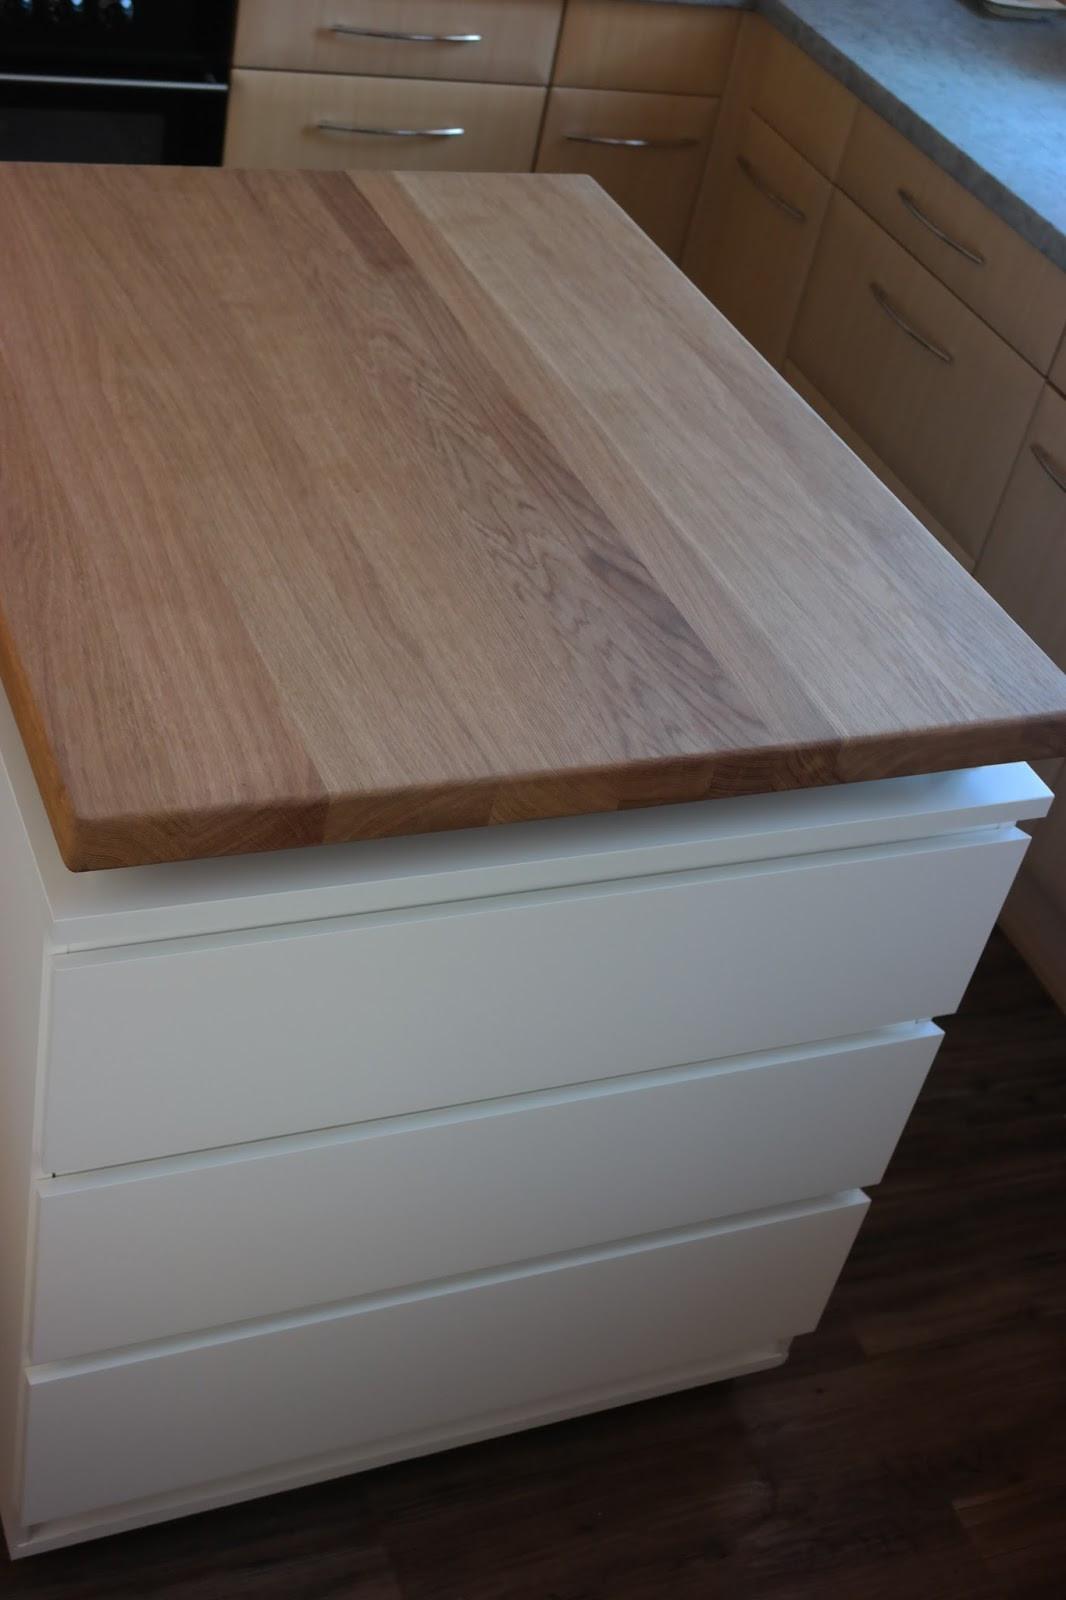 Kücheninsel Diy  Miss Zuckerfee Ikea Kücheninsel DIY